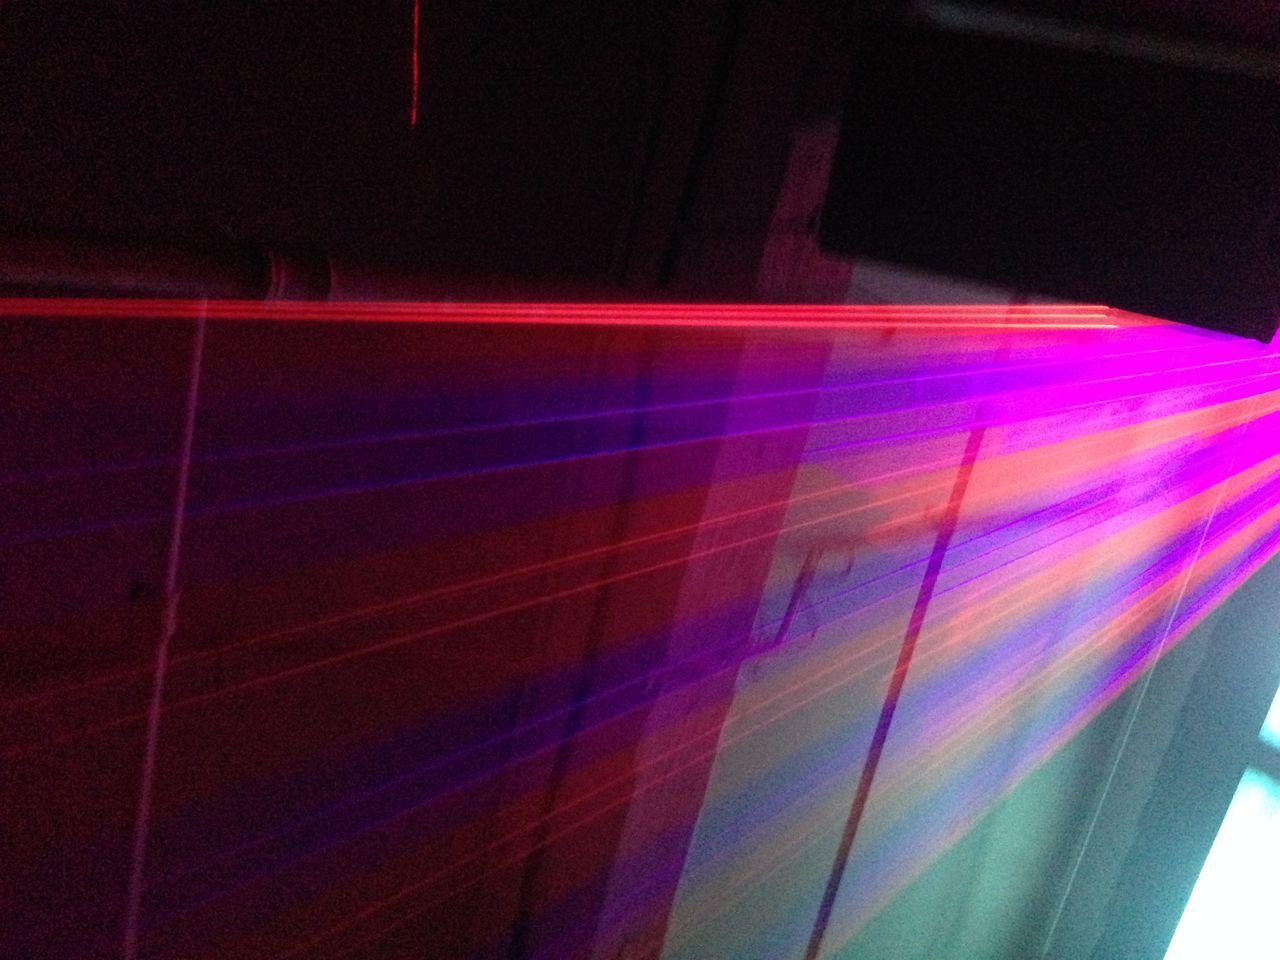 Close-up Dance Edm Illuminated Indoors  Lasers Light And Shadow Lighting Equipment Multi Colored Neon Neon Lights Night No People Raves